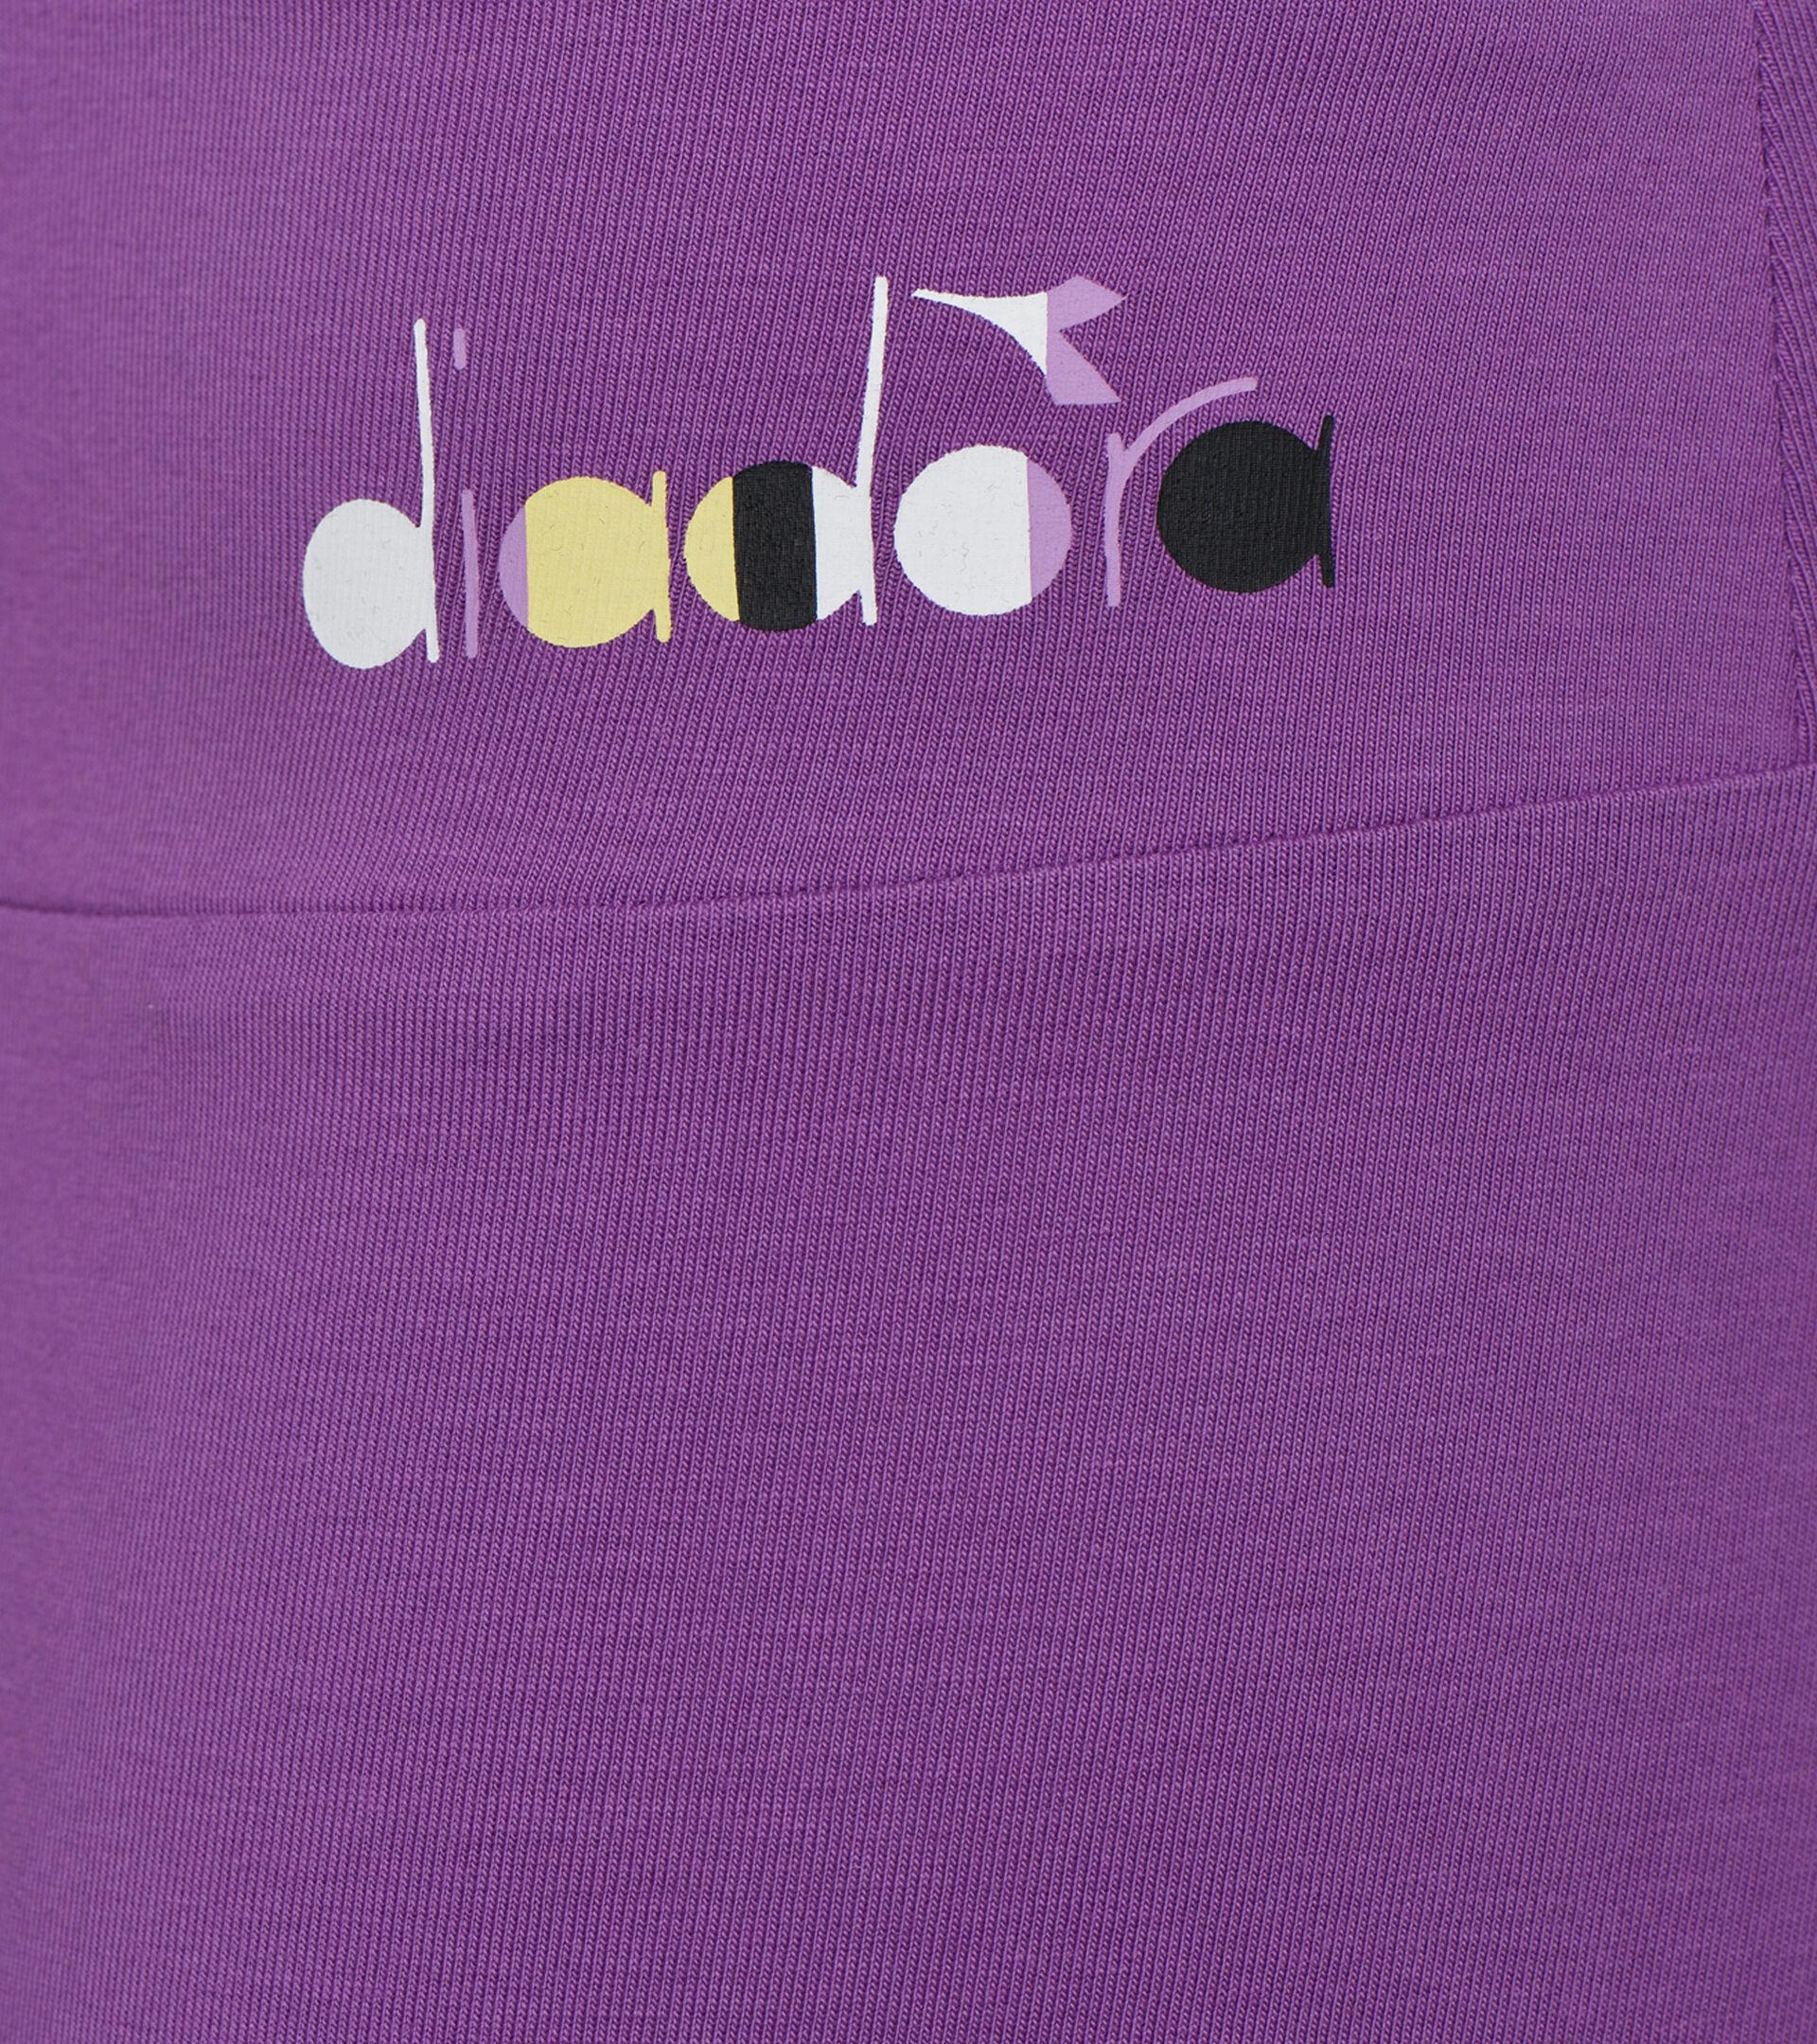 Leggings - Damen L.LEGGINGS SPOTLIGHT TAUBEEREN - Diadora